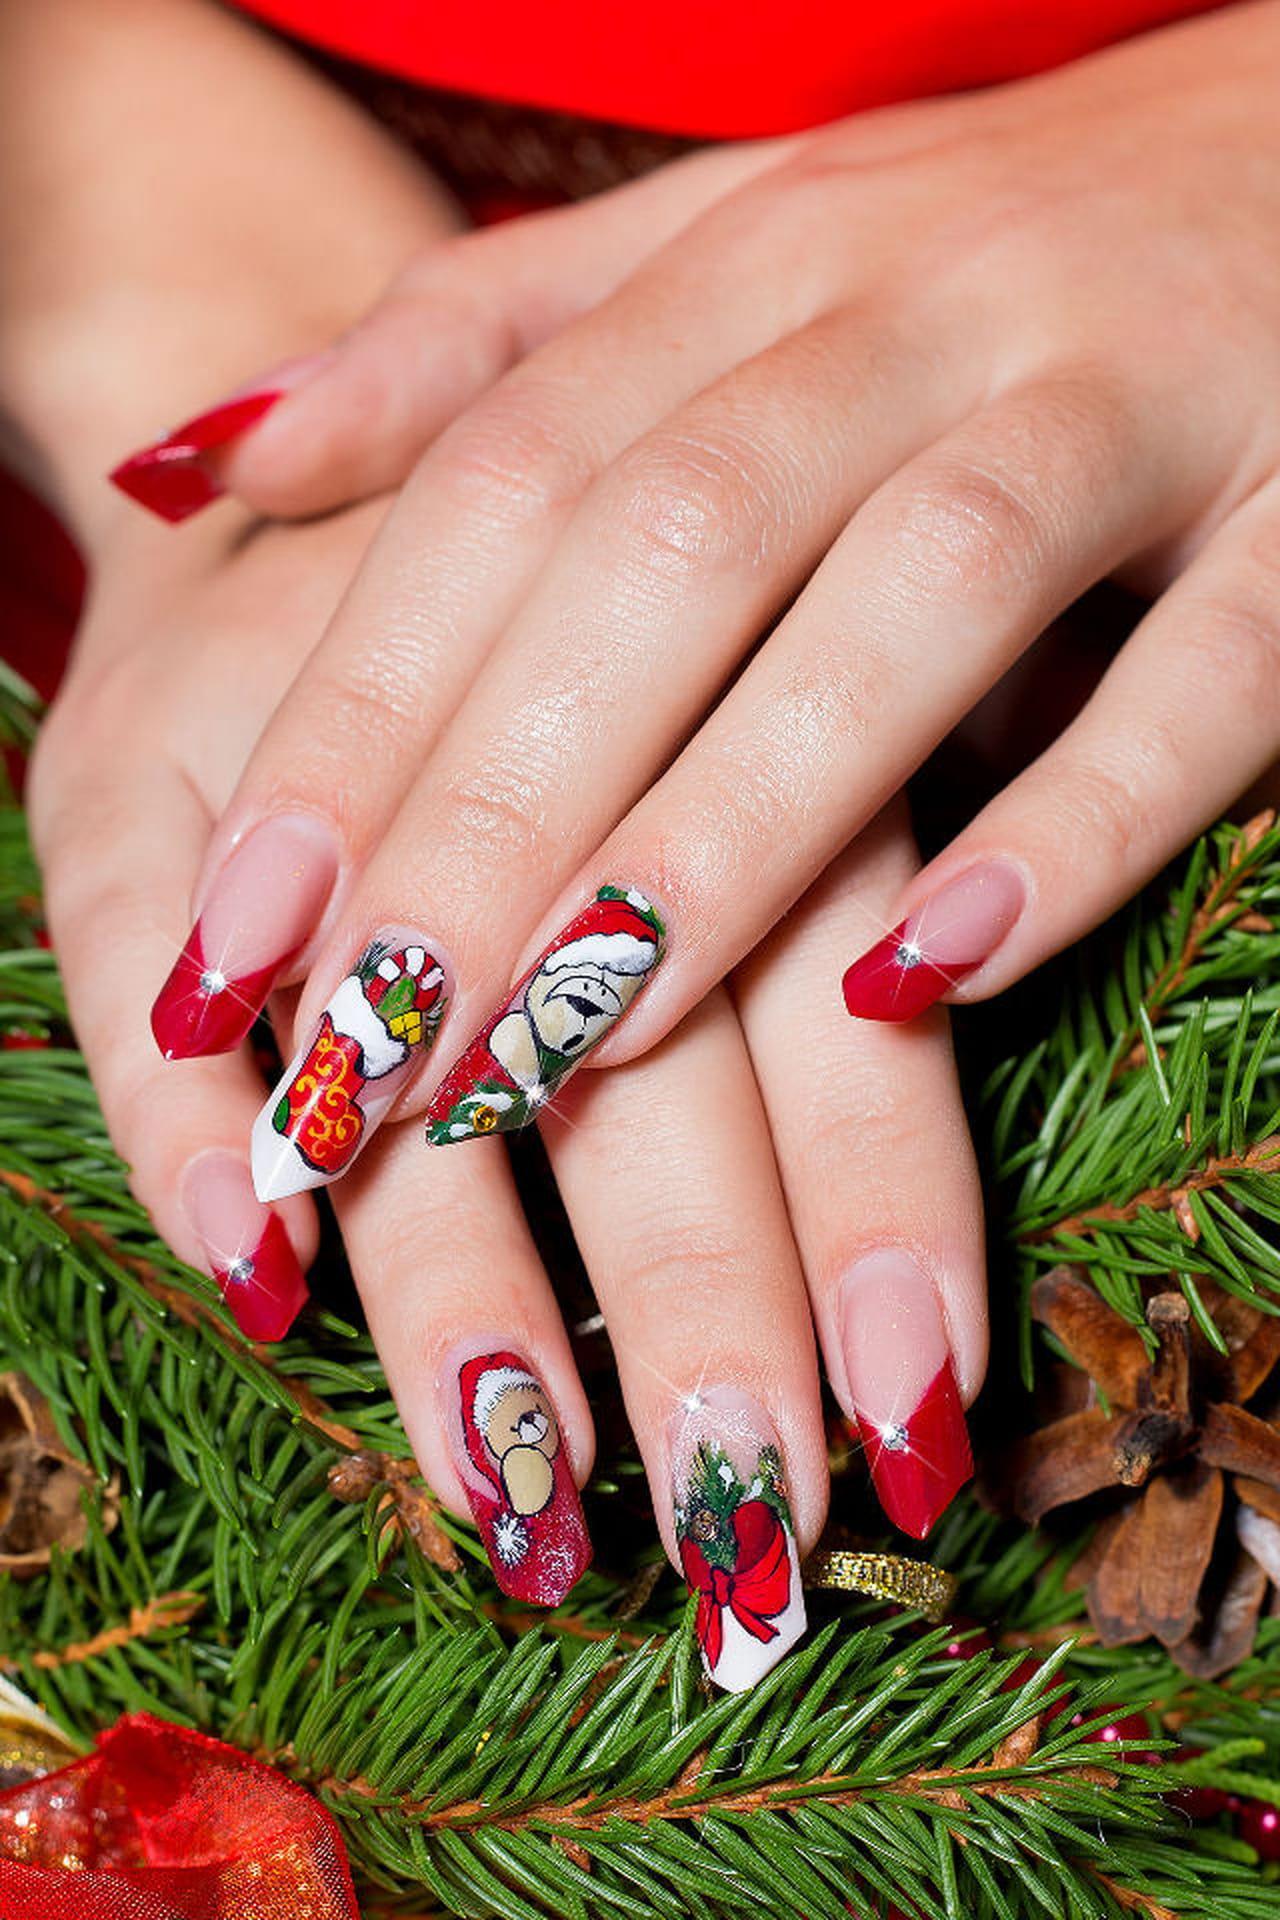 Unghie di natale decorazioni o gel for Decorazioni natalizie unghie